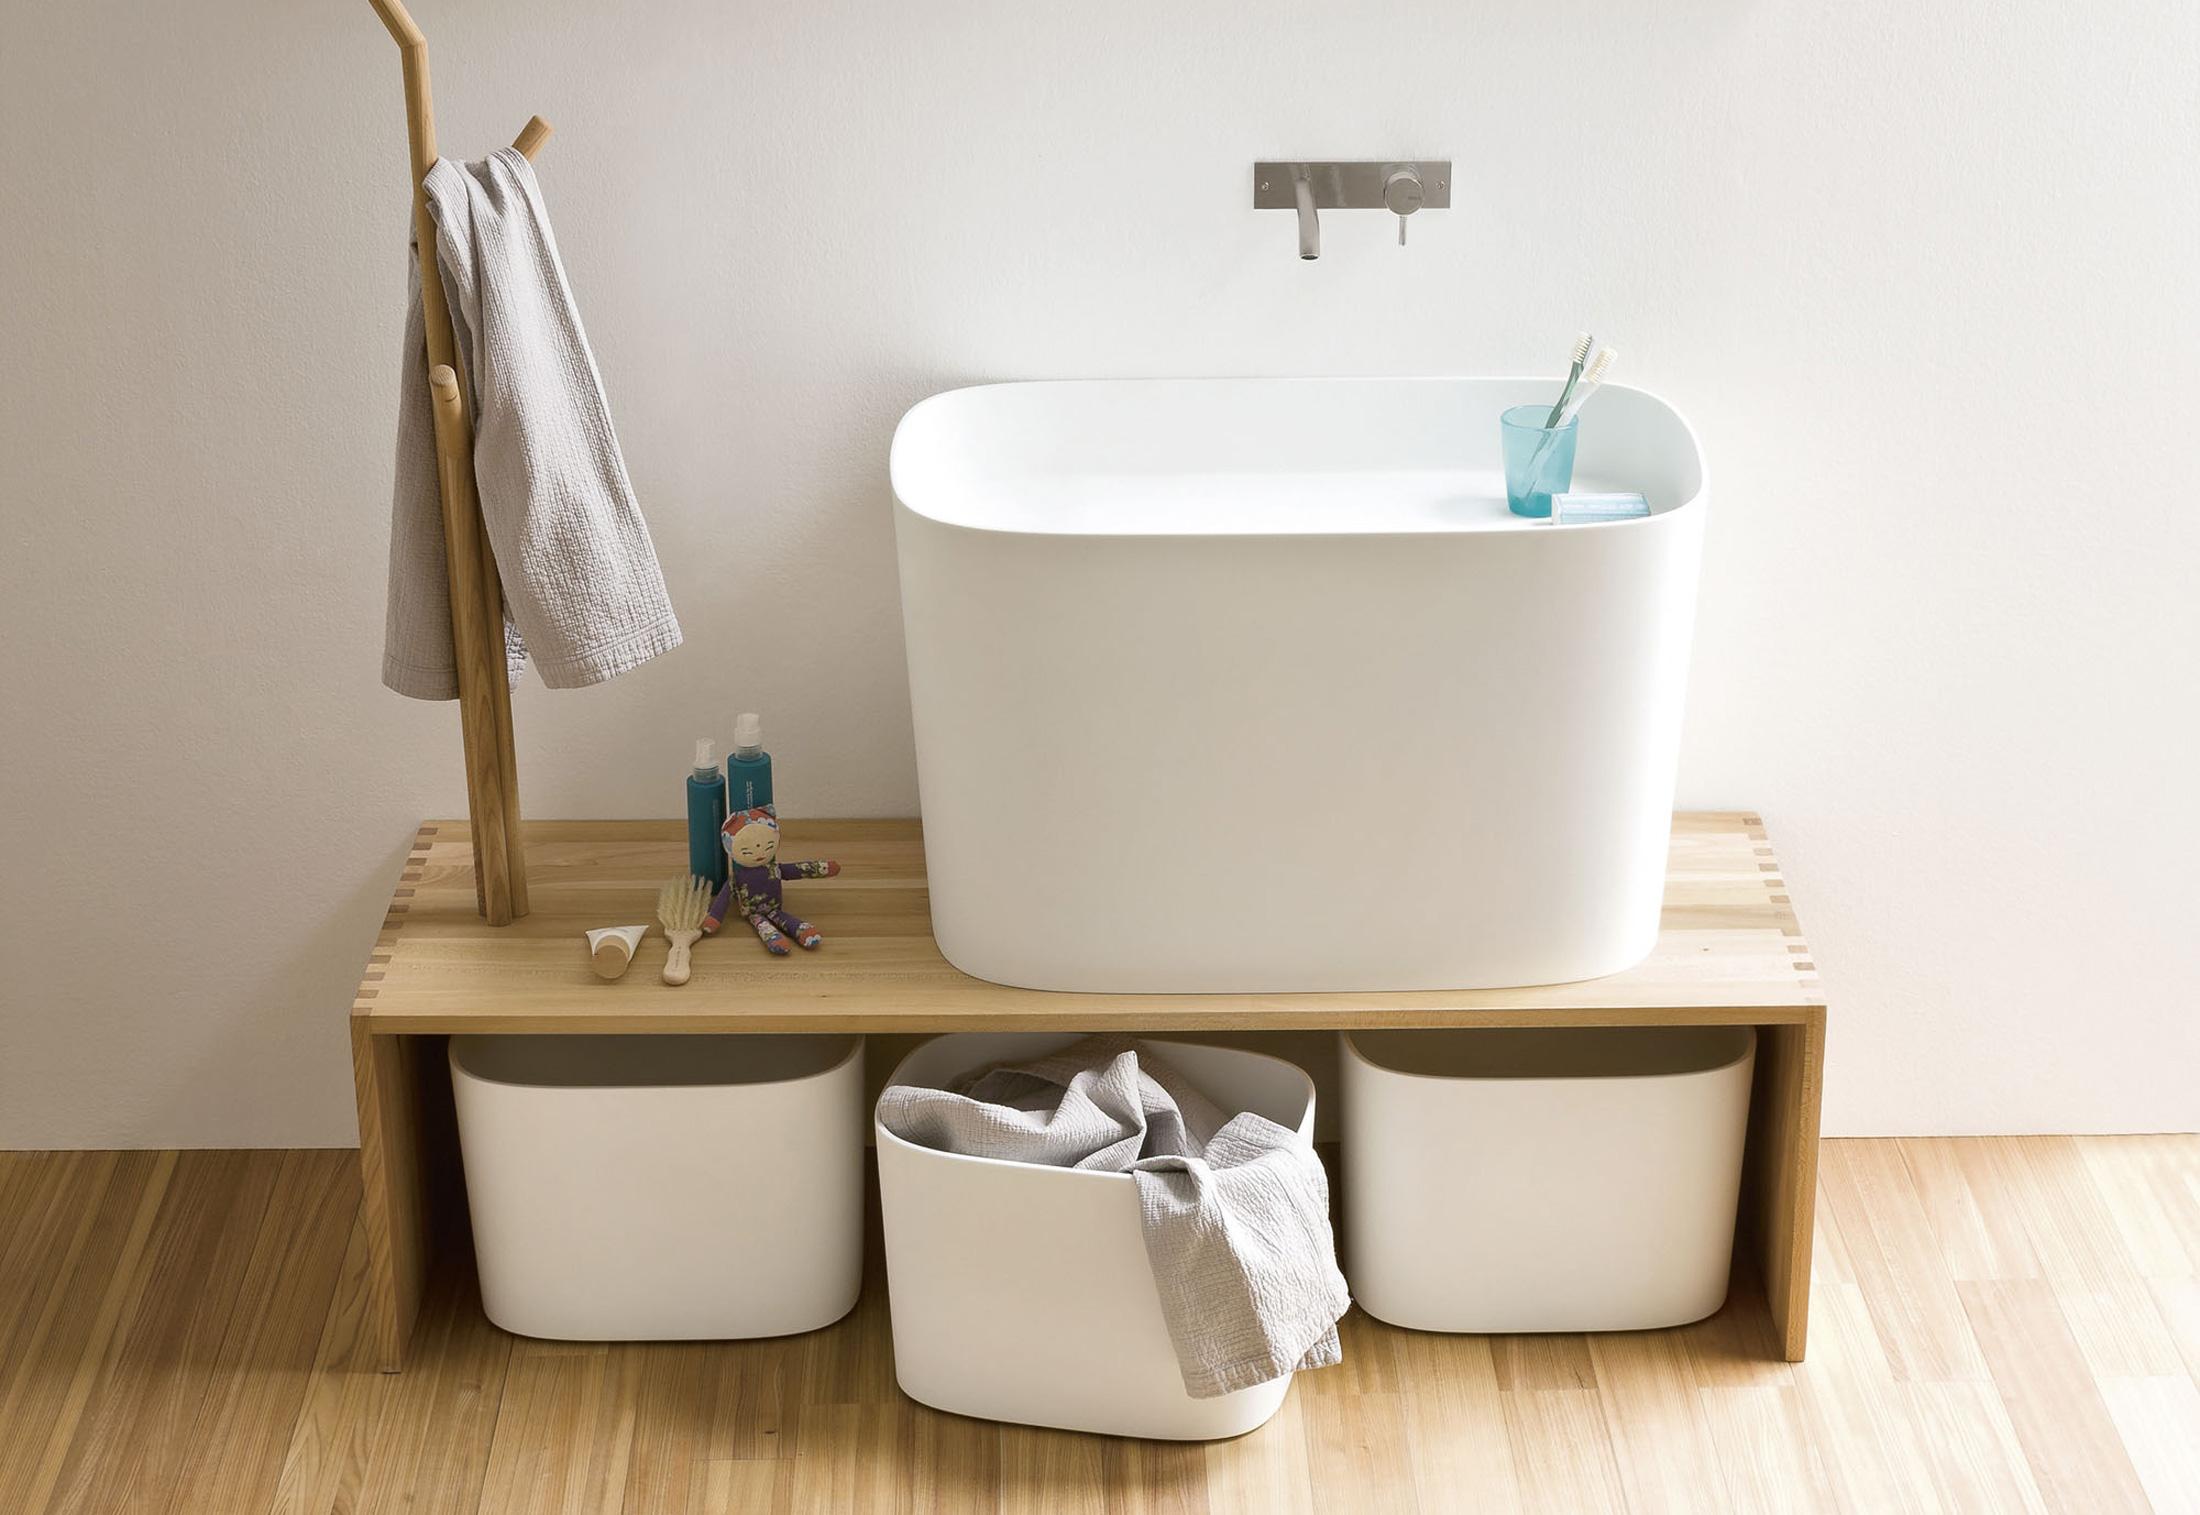 Fonte laundry basket by Rexa Design | STYLEPARK